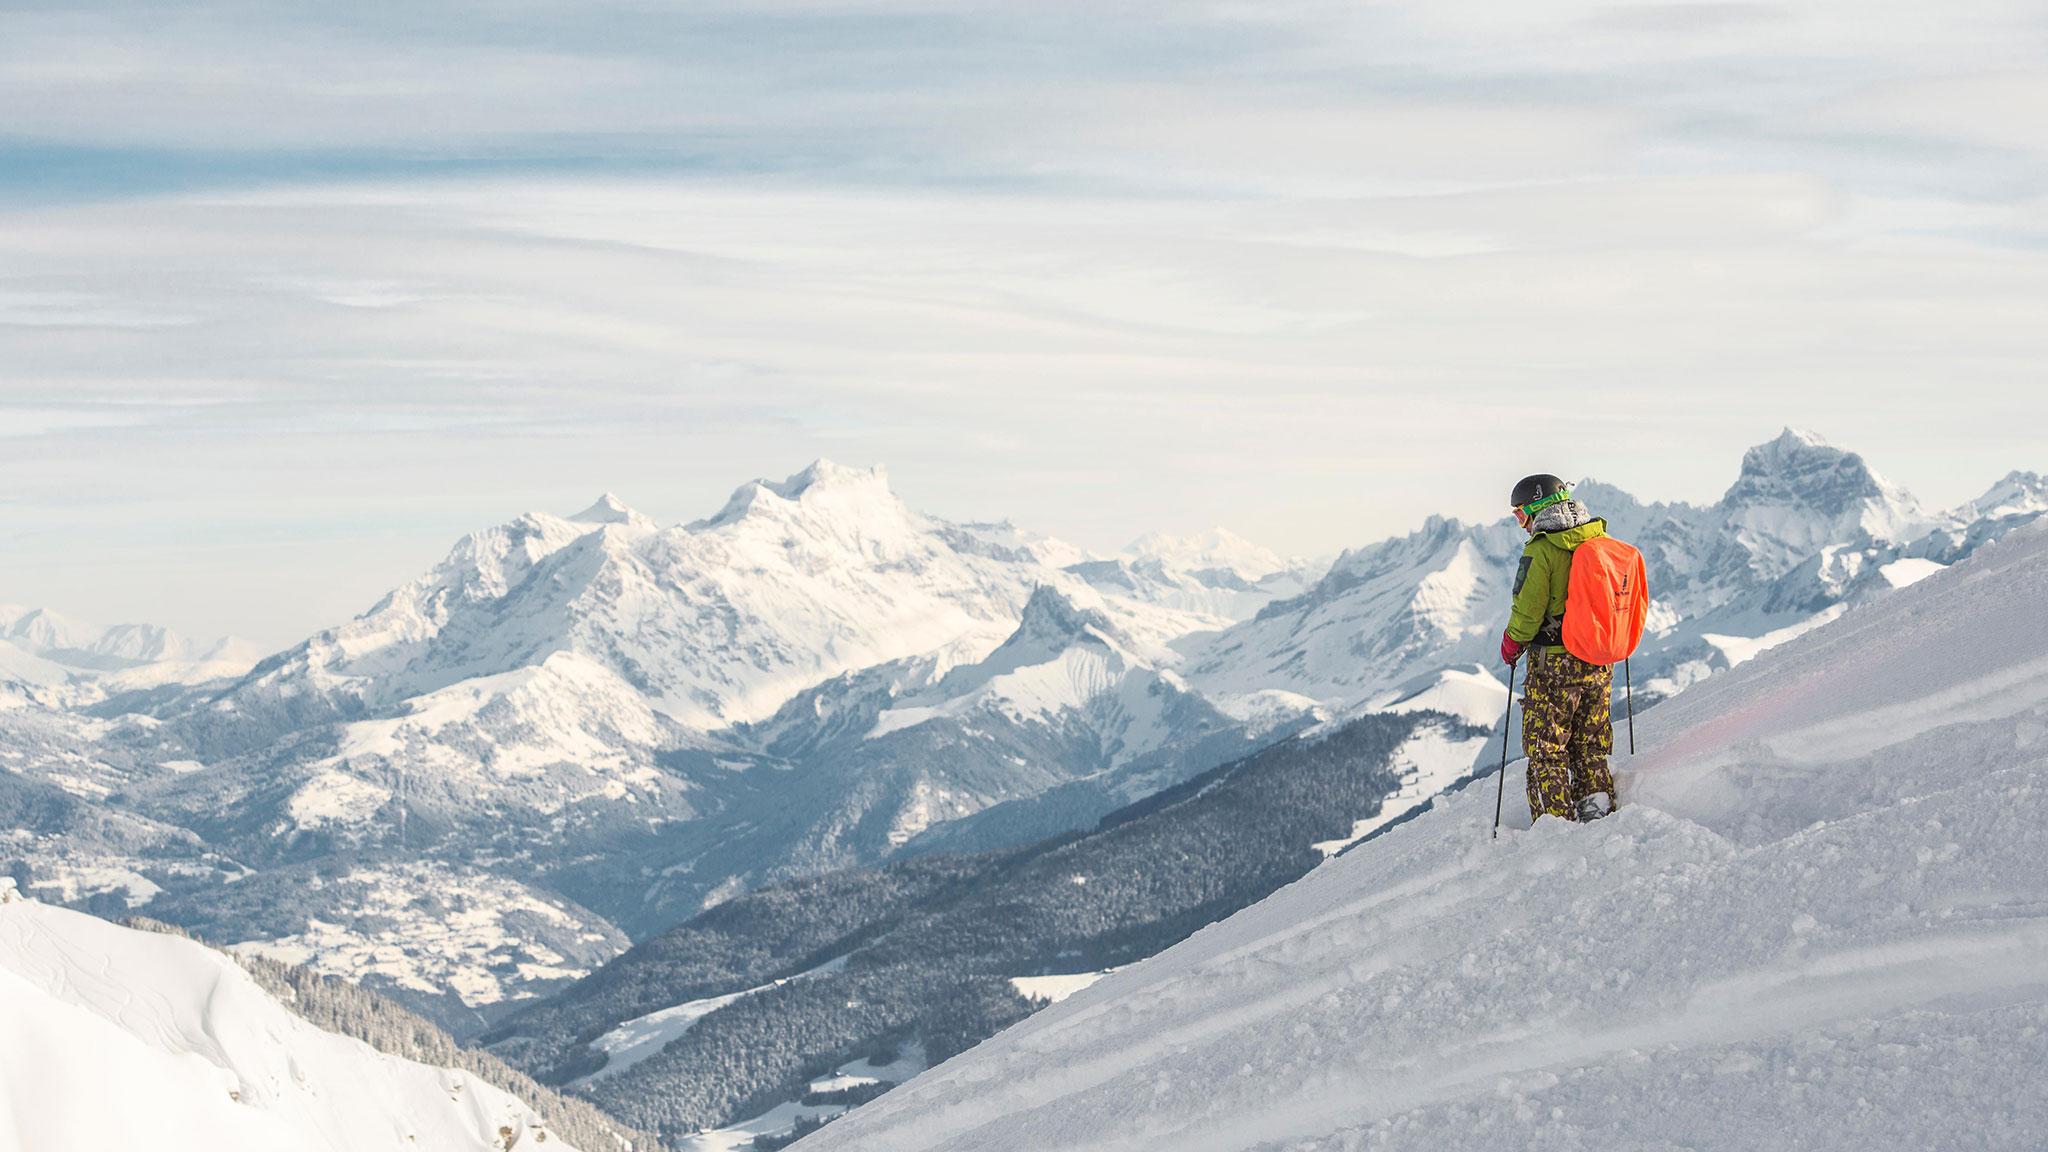 Crawl Walk Ski Snow Sports Funny Future Skier Slopes Instructor Skies Mountain Winter Cool Toddler Shirt